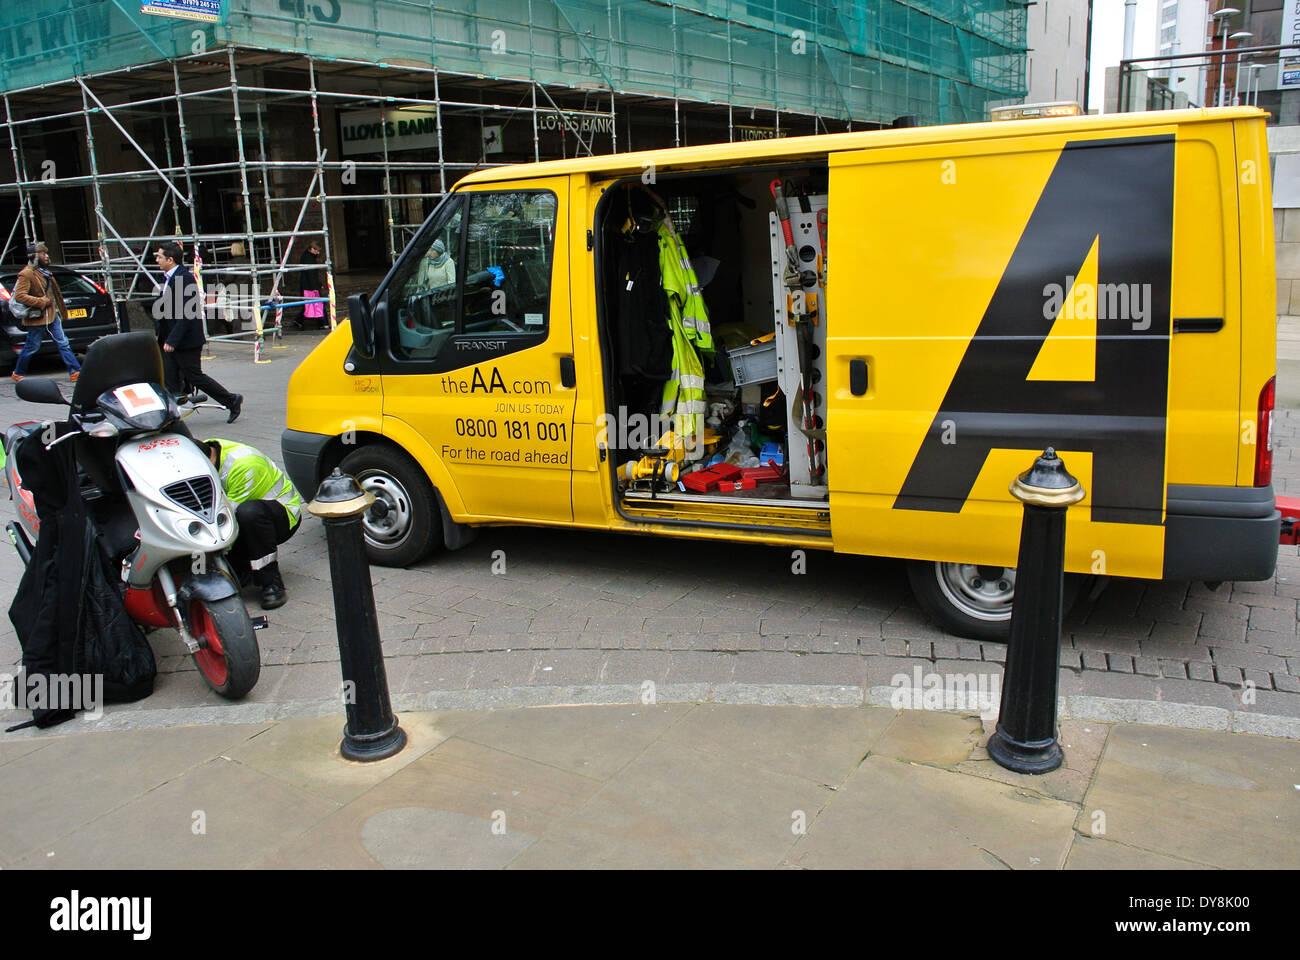 AA breakdown vehicle emergency service - Stock Image